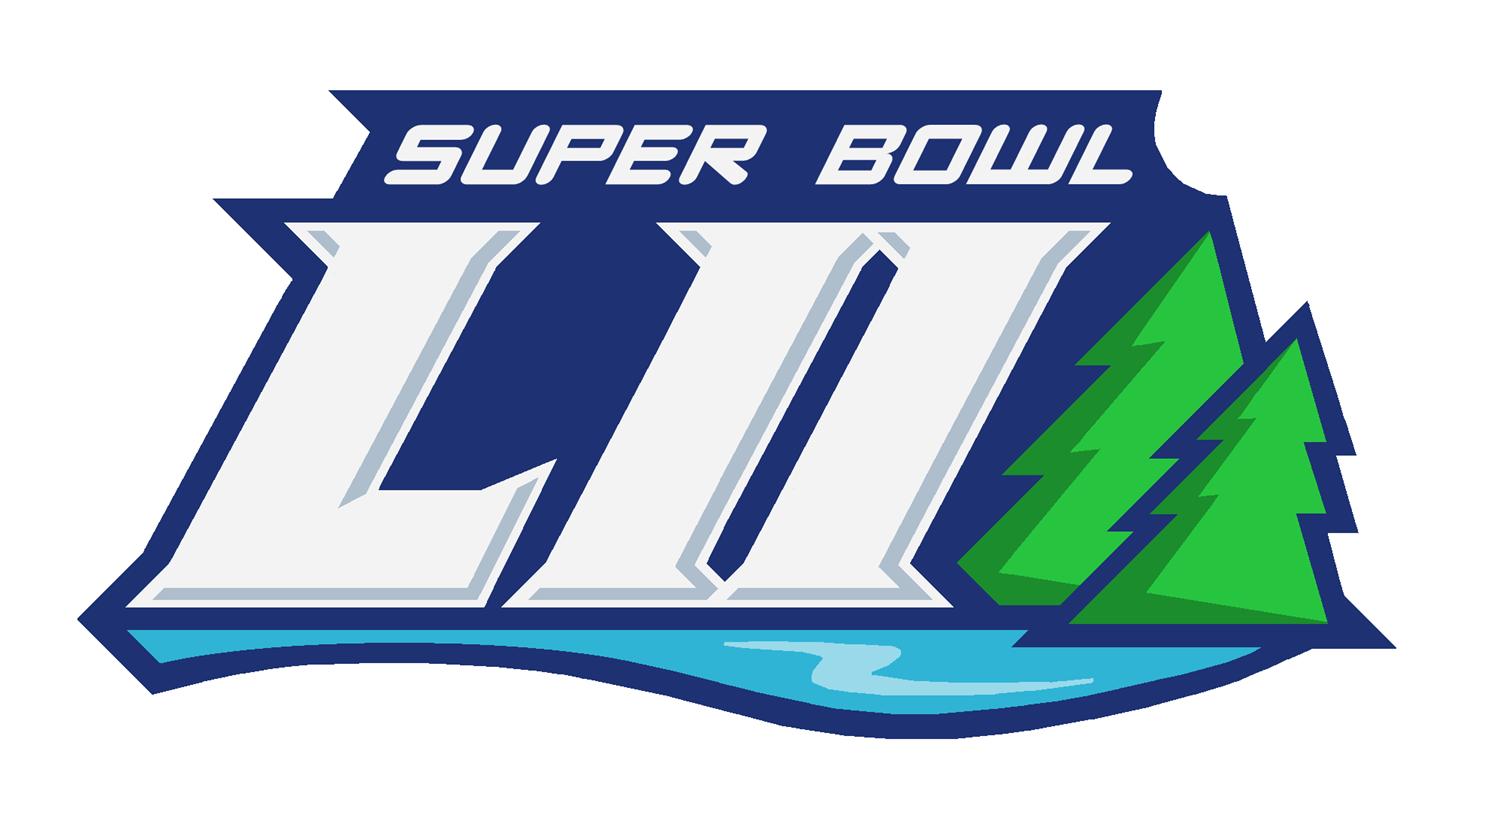 2767390cc63 1485x833 Super Bowl Lii Logo Concept. 1485x833 Super Bowl Lii Logo Concept.  160x320 Super Bowl Snack Taco Dip Recipe And Tom Brady Clip Art